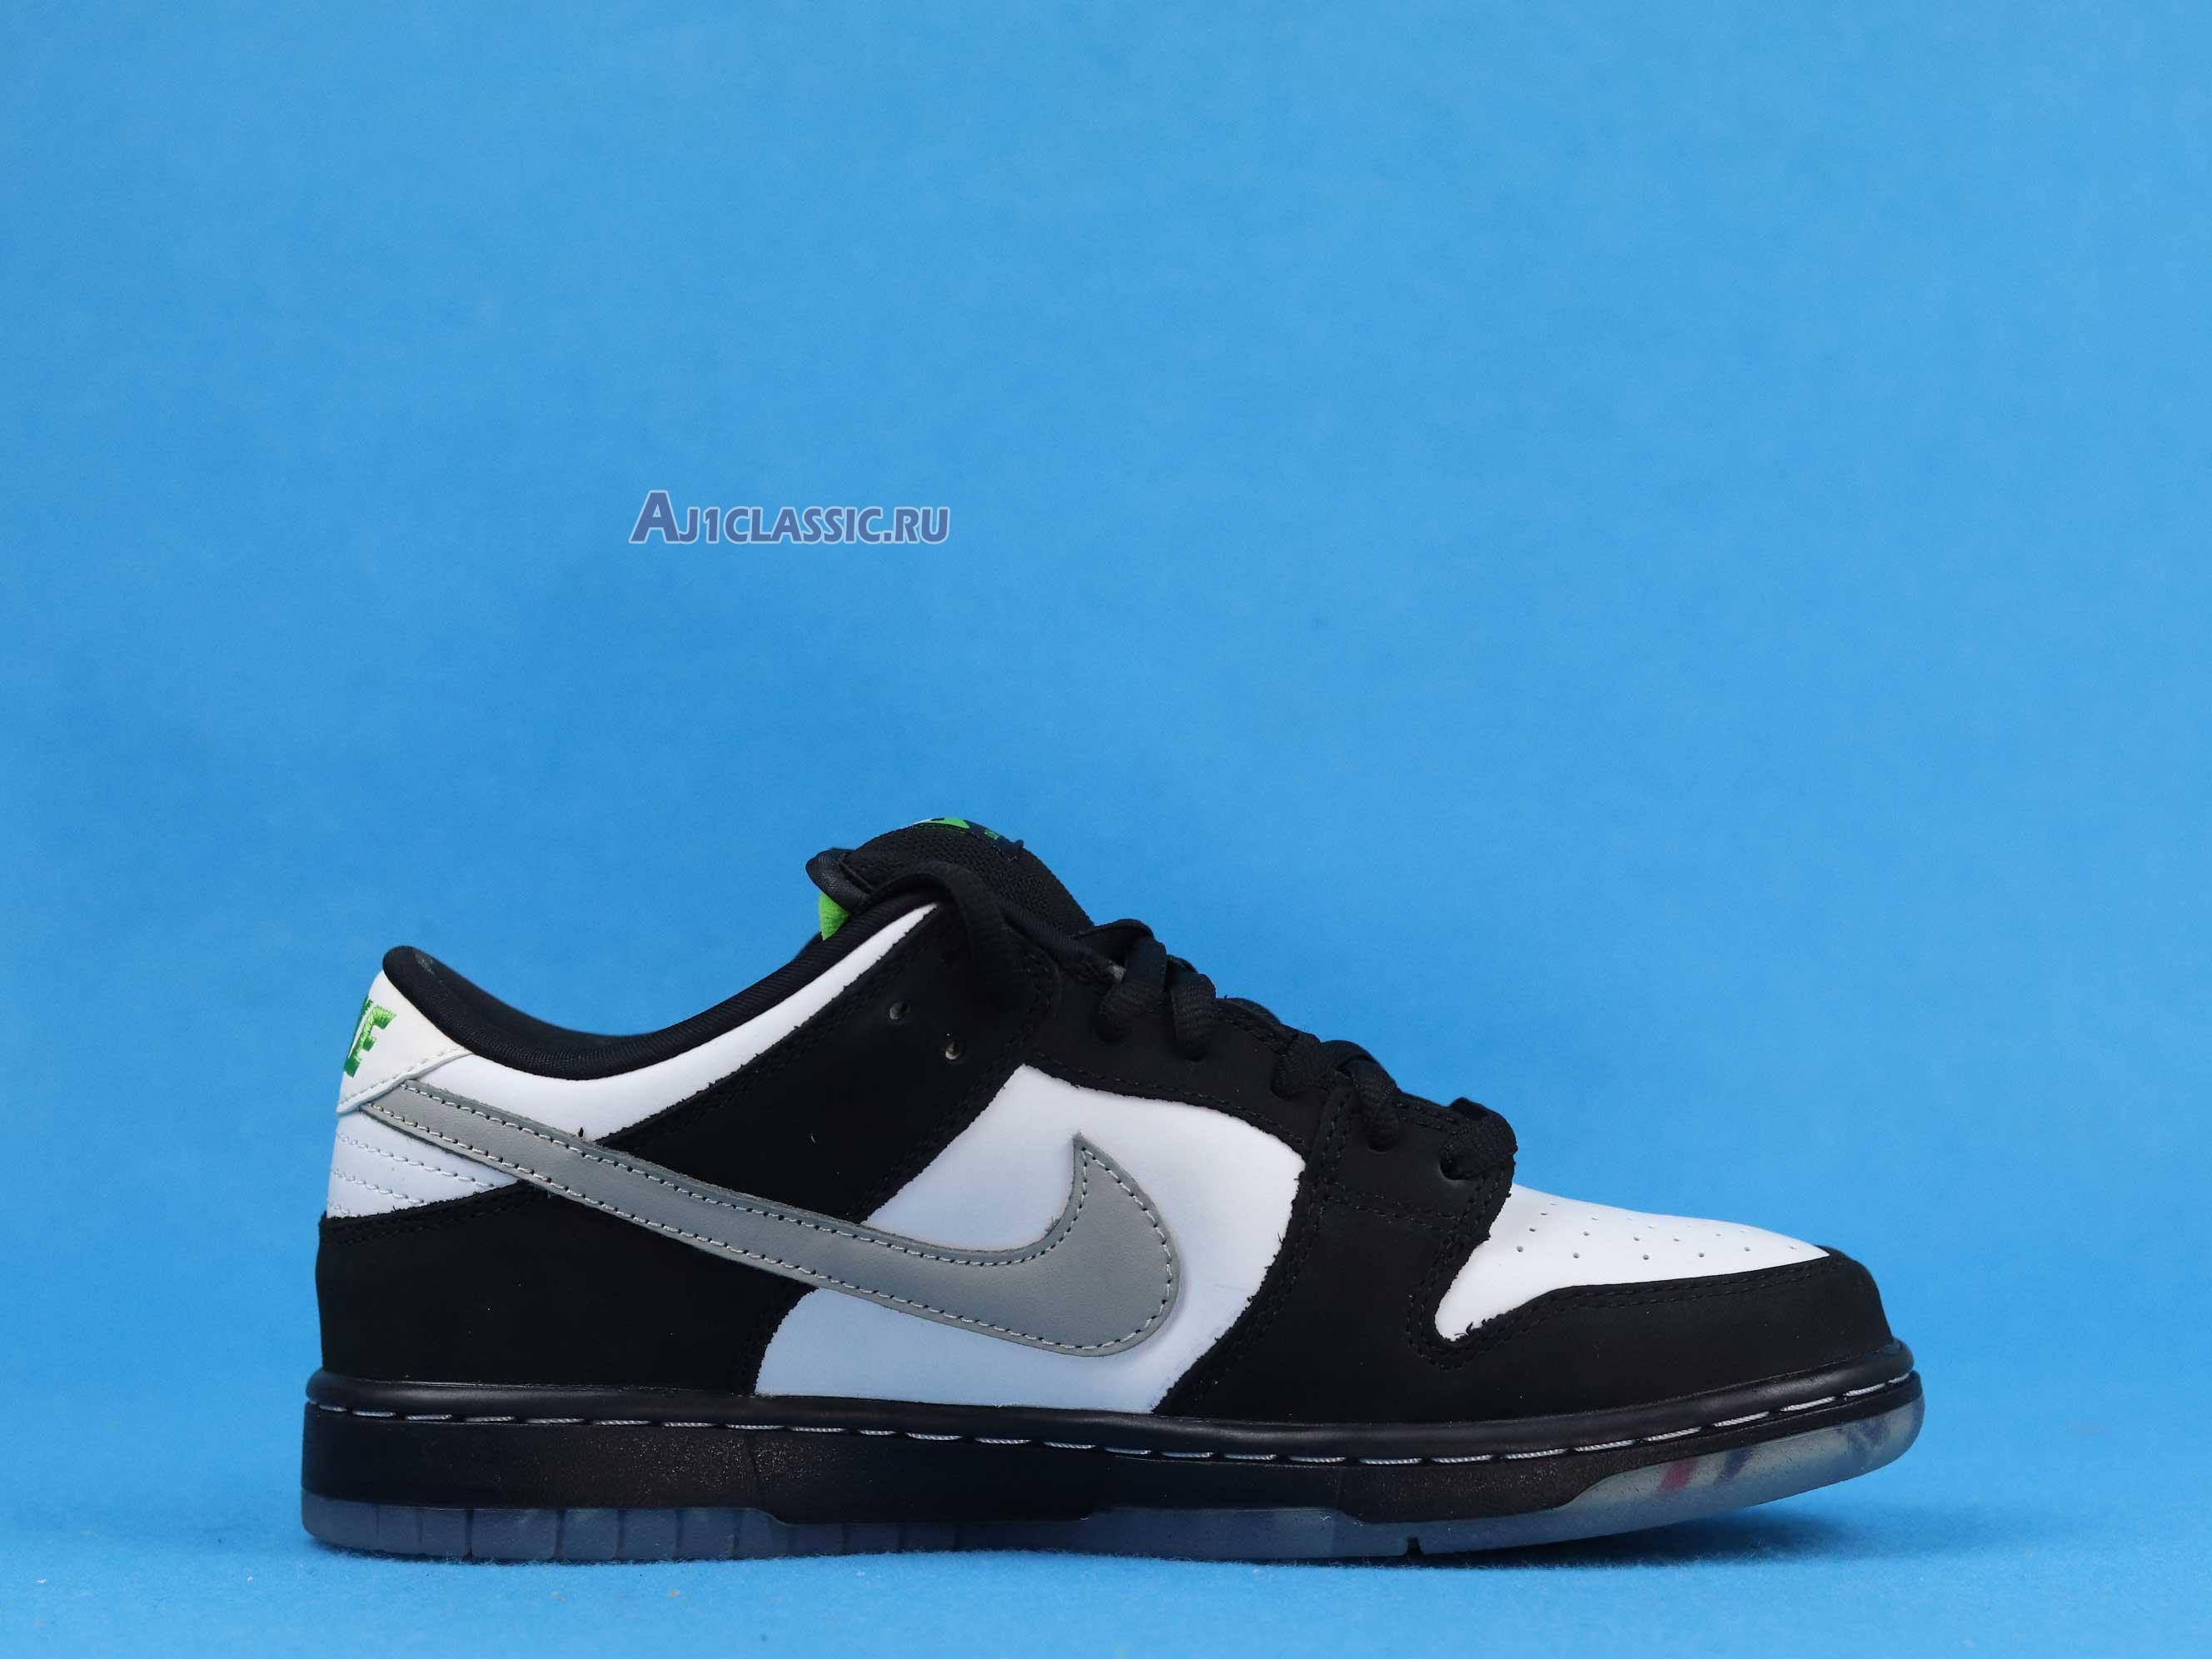 "Nike Jeff Staple x Dunk Low Pro SB ""Panda Pigeon"" Special Box BV1310-013"